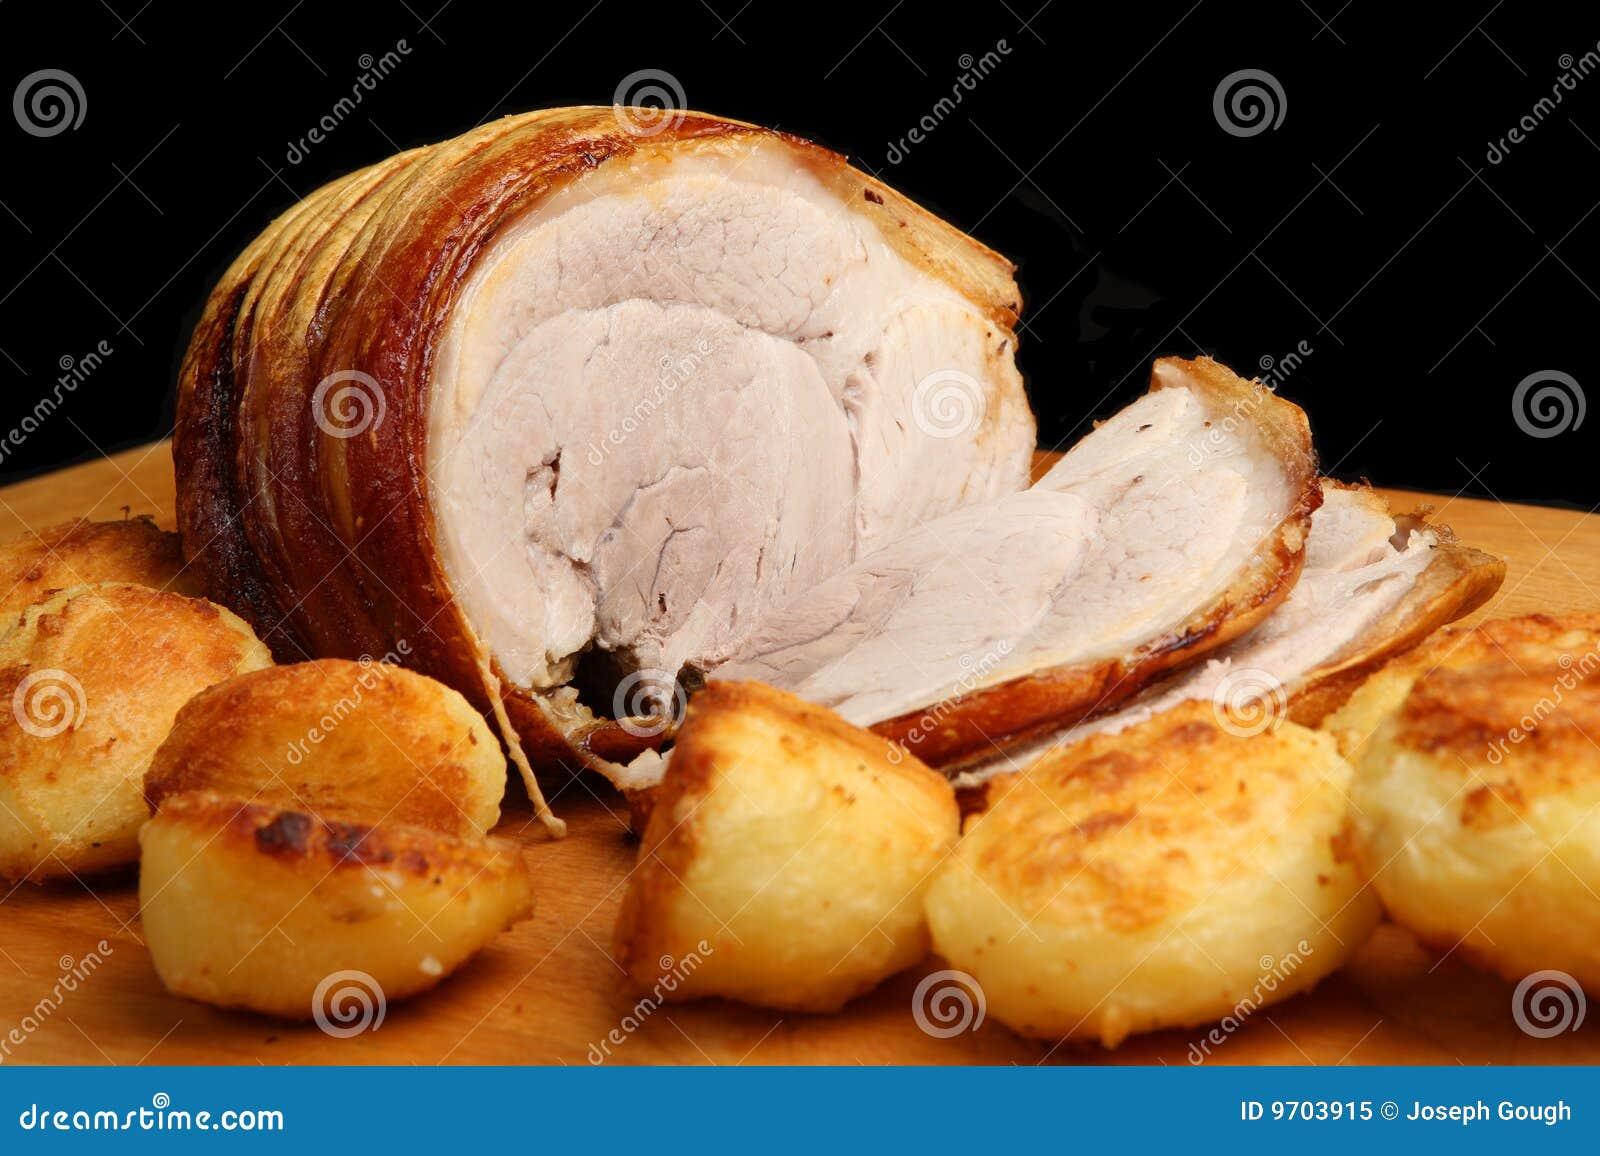 Roast Pork with Potatoes